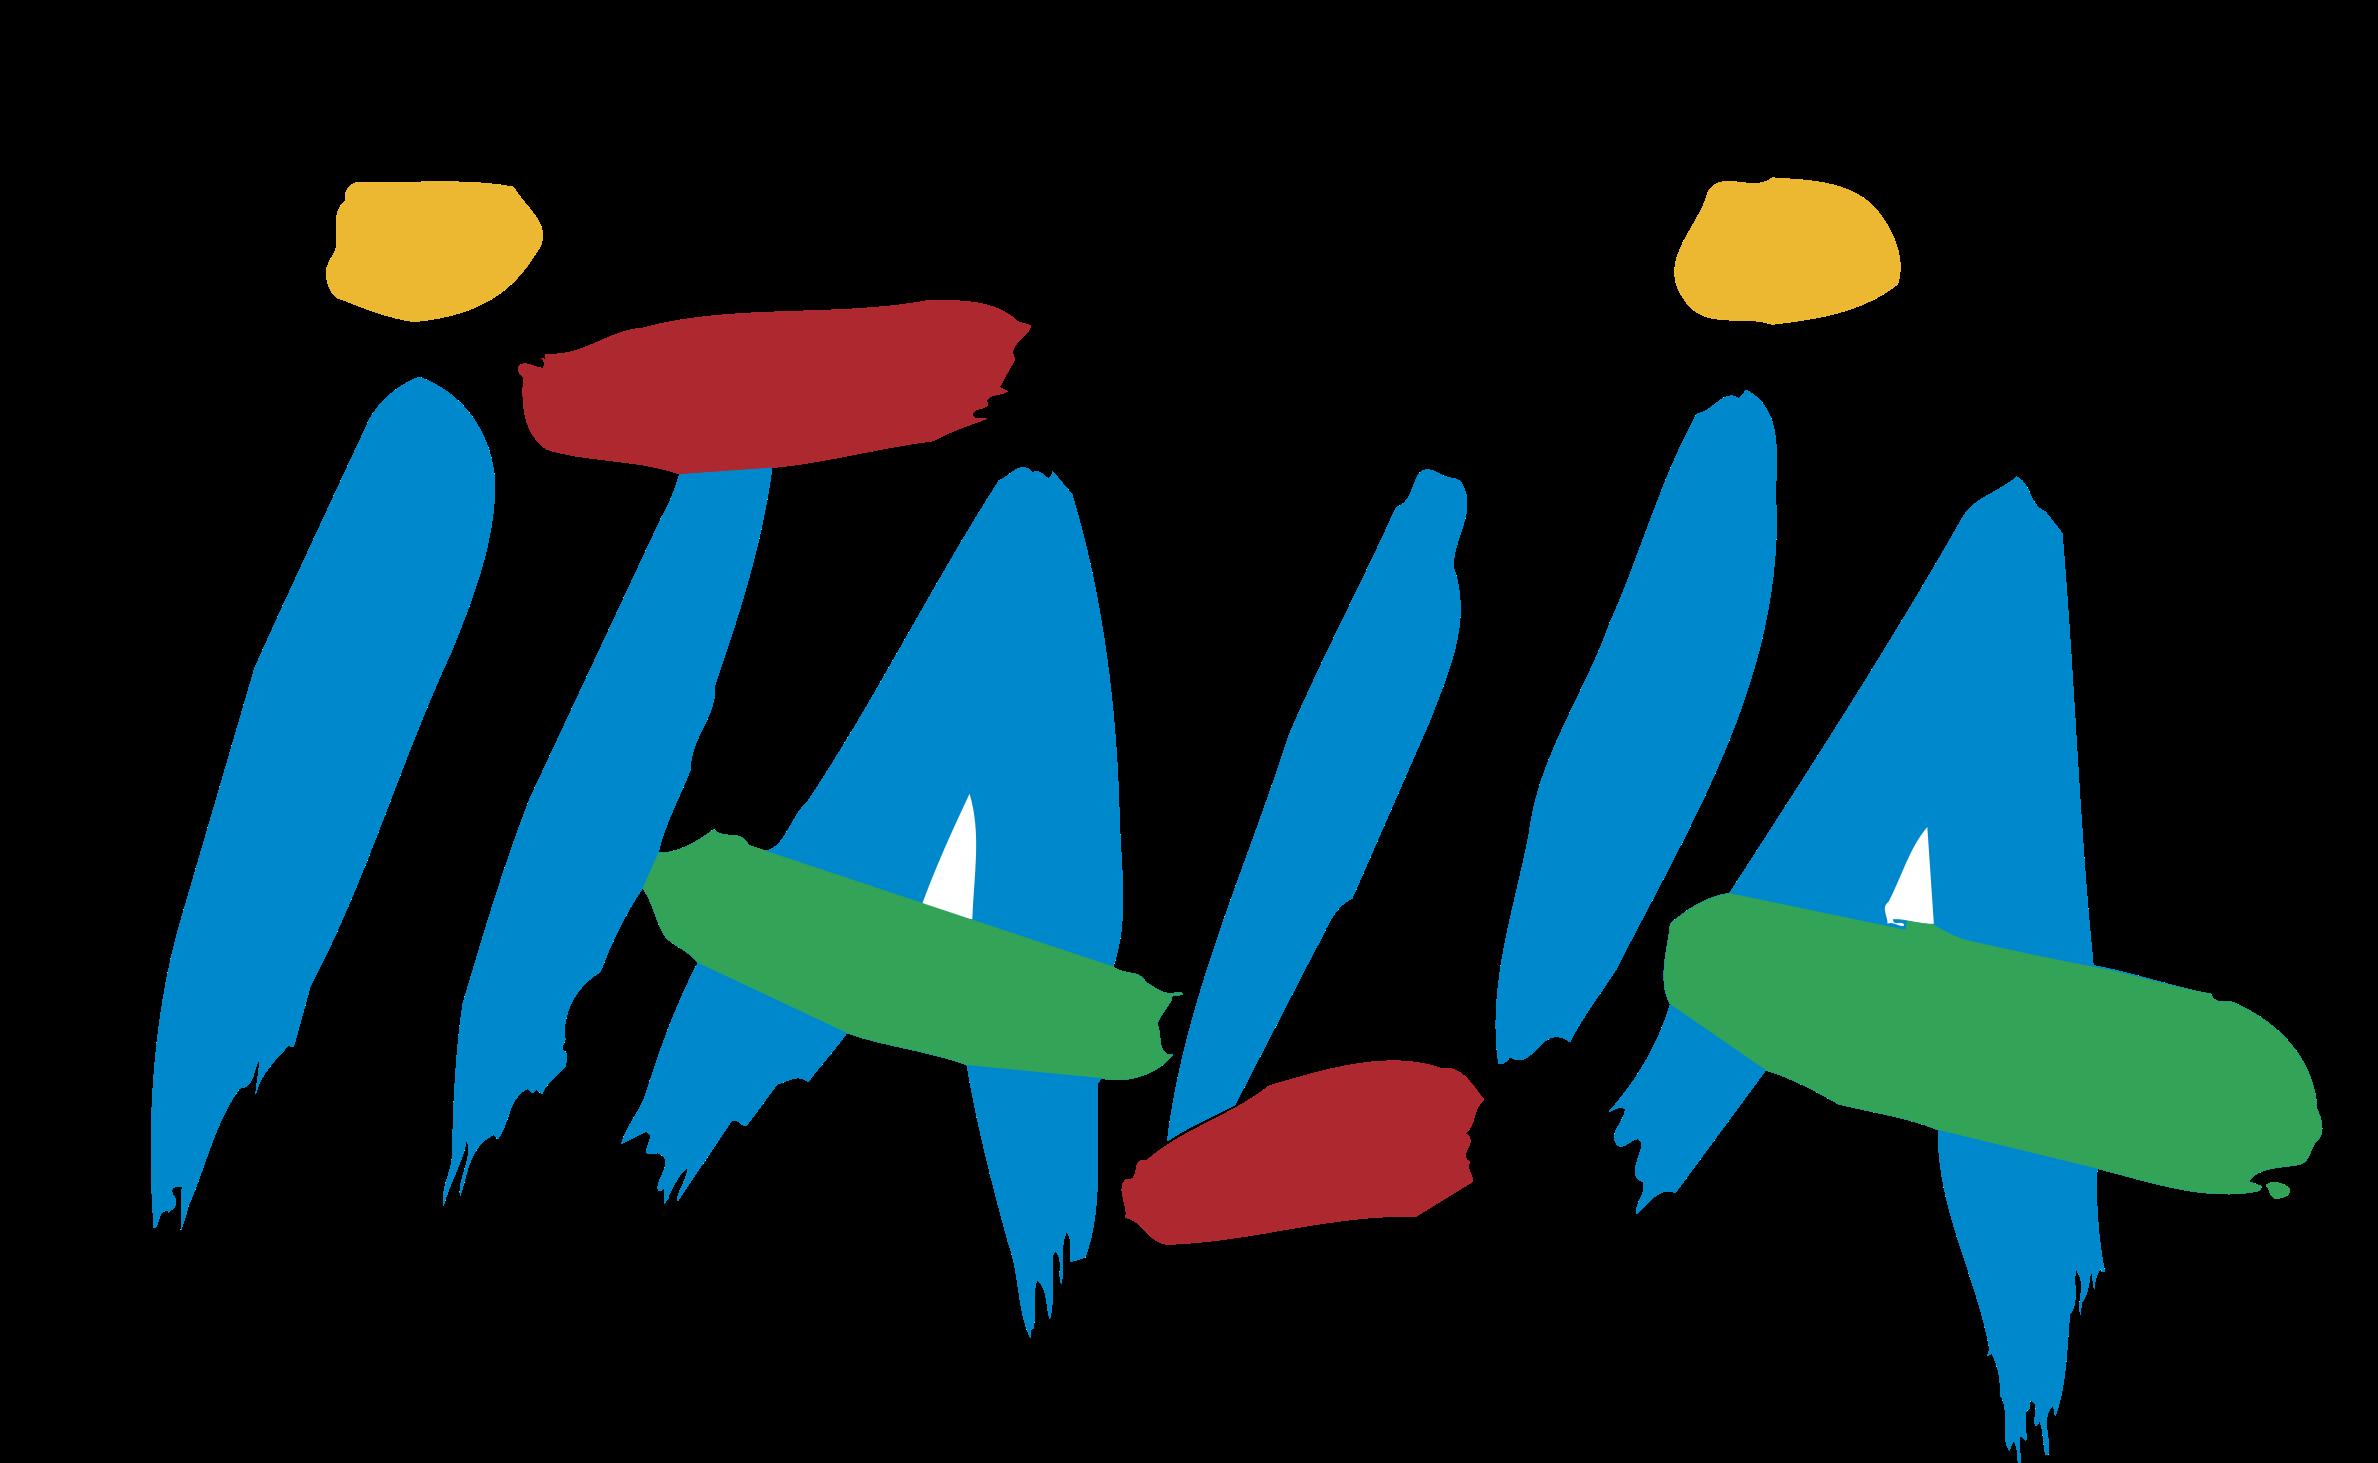 italia-logo-png-transparent.png